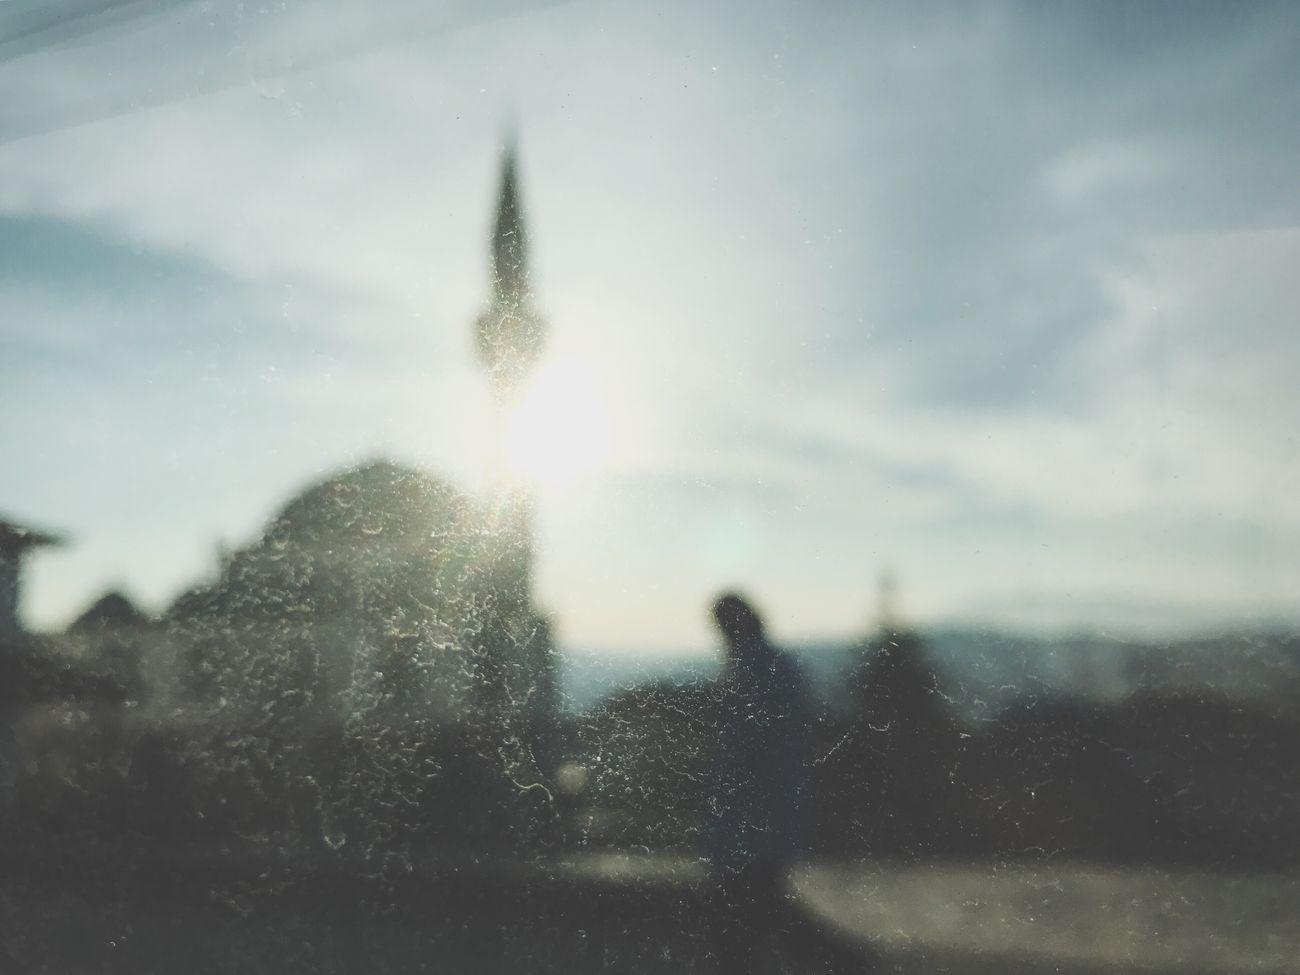 Bulgarian Mosque against the sun rise Sky Motion Background Wallpaper Defocused No People Day Nature Outdoors RainDrop Close-up Man Mosque Islam Blurred Motion Contre-jour Contrejour Contre Jour Contre-jour Shot Window Dirt Beam Light